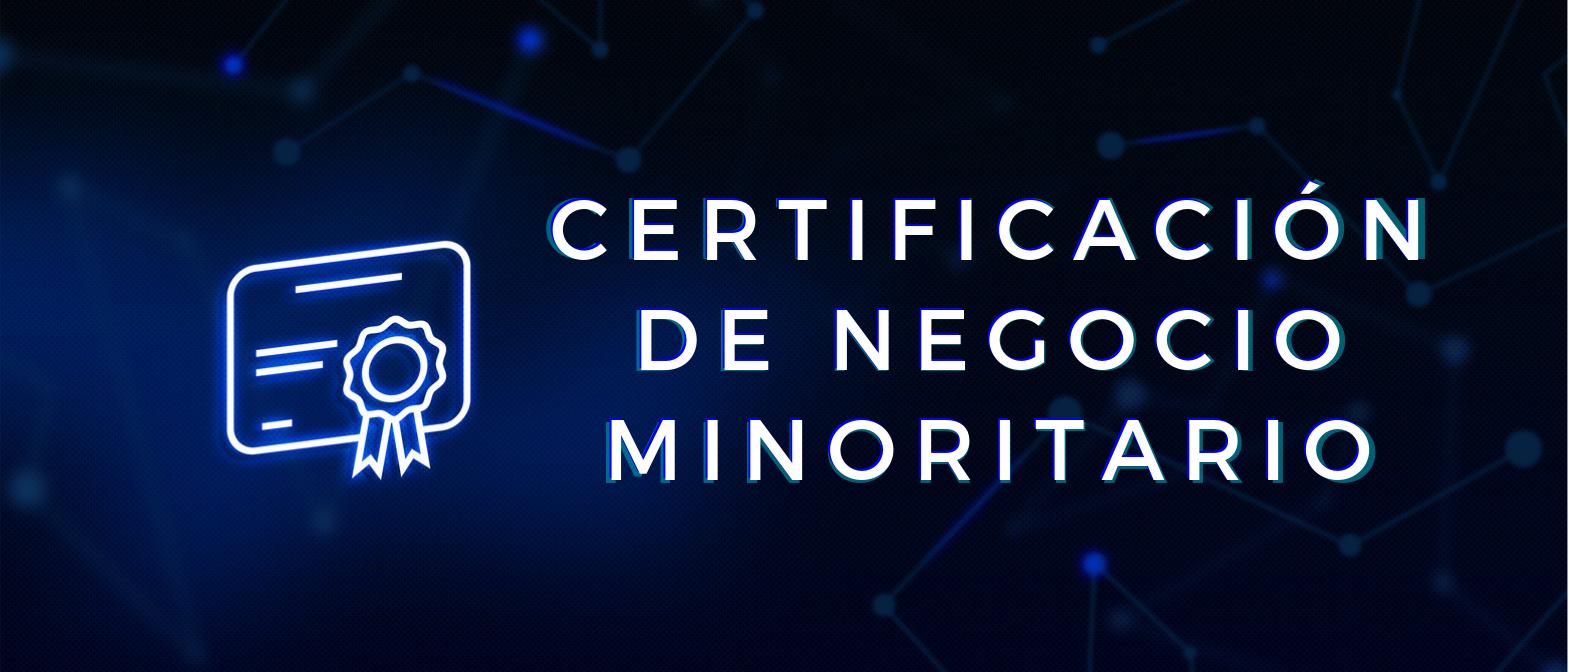 Logro, certificación, diploma, documento. Concept: certificación de negocio minoritario